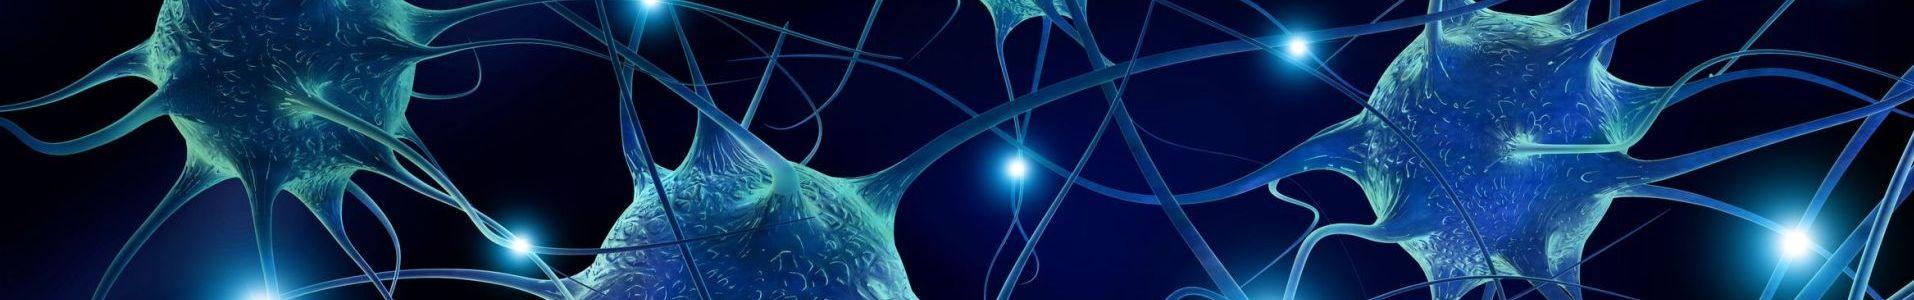 brain based programs